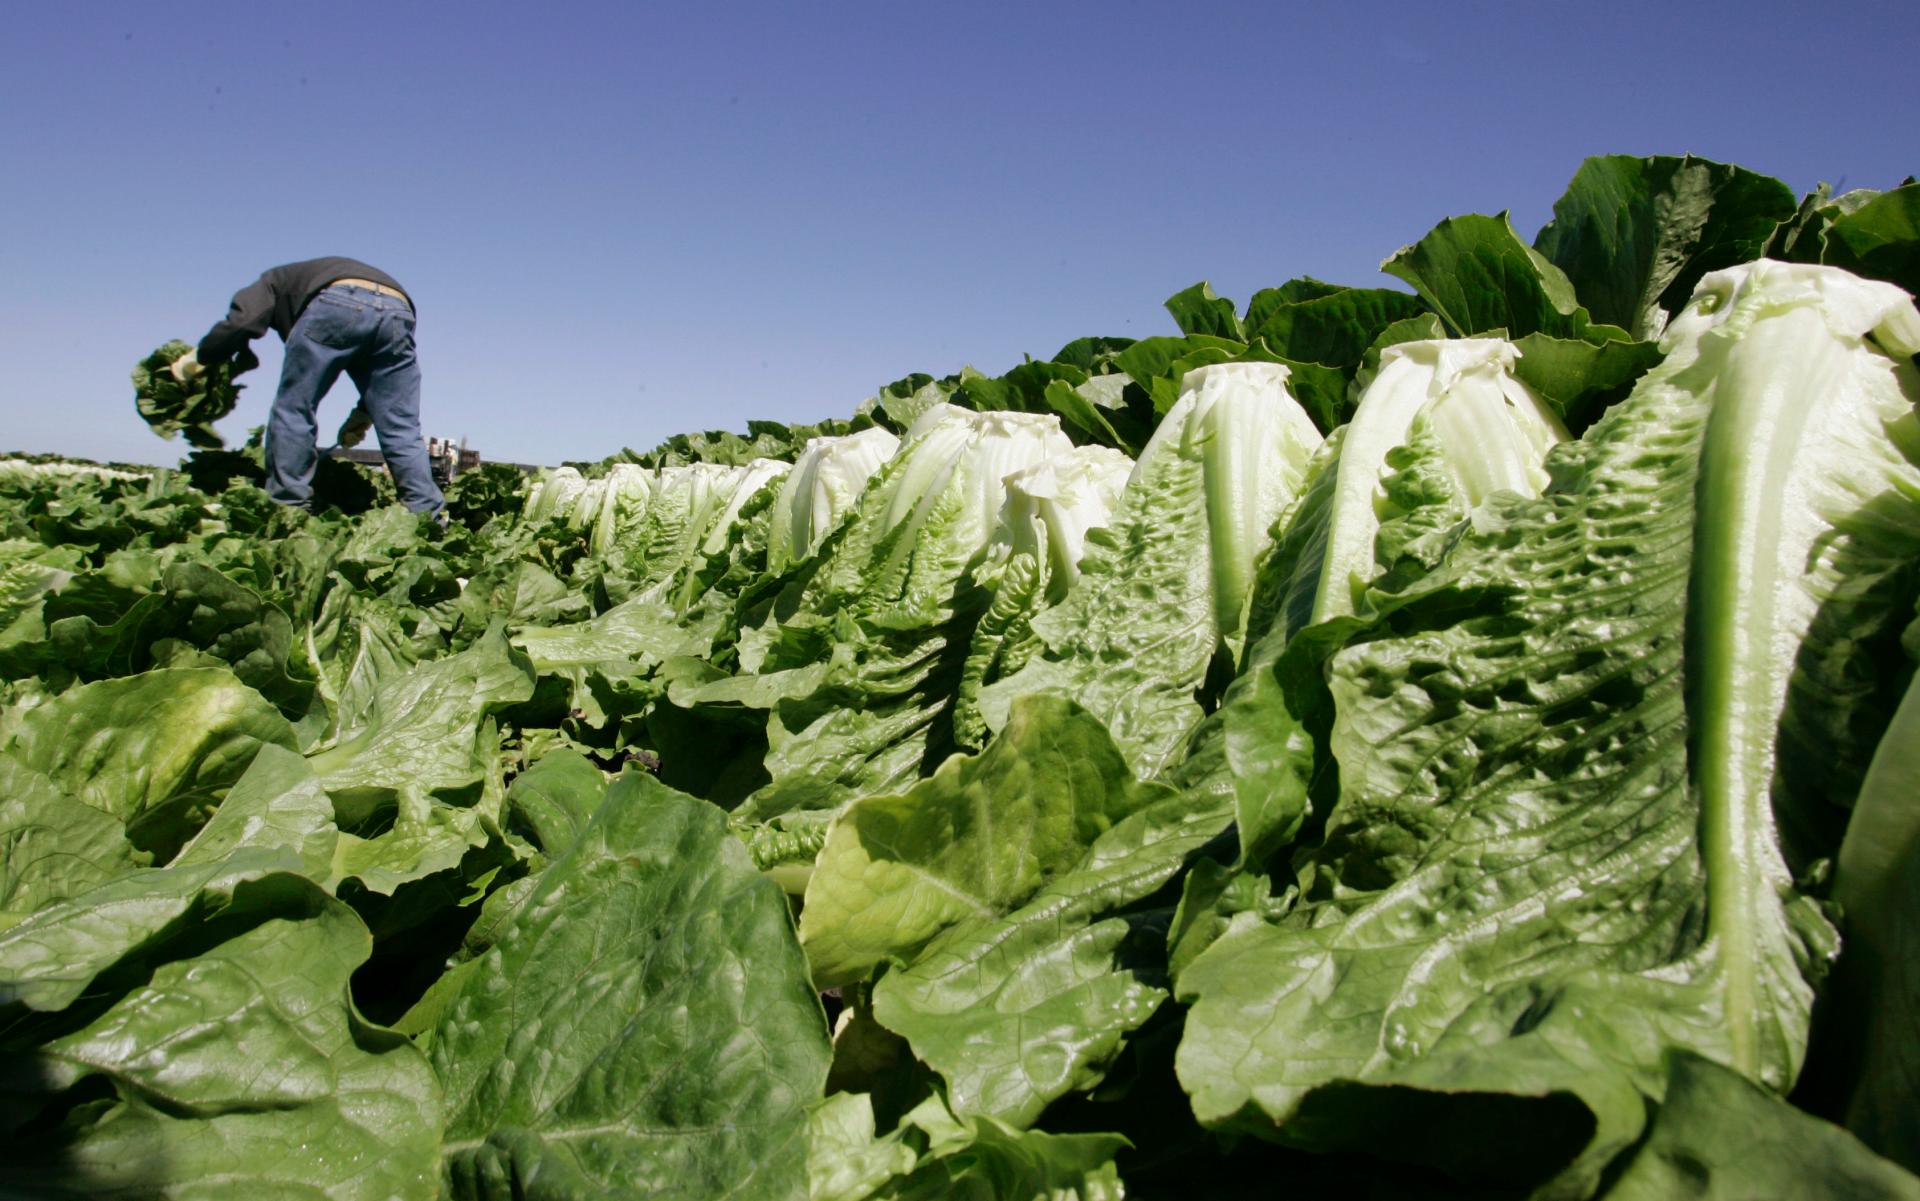 FOX NEWS Romaine lettuce E. coli outbreak tied to